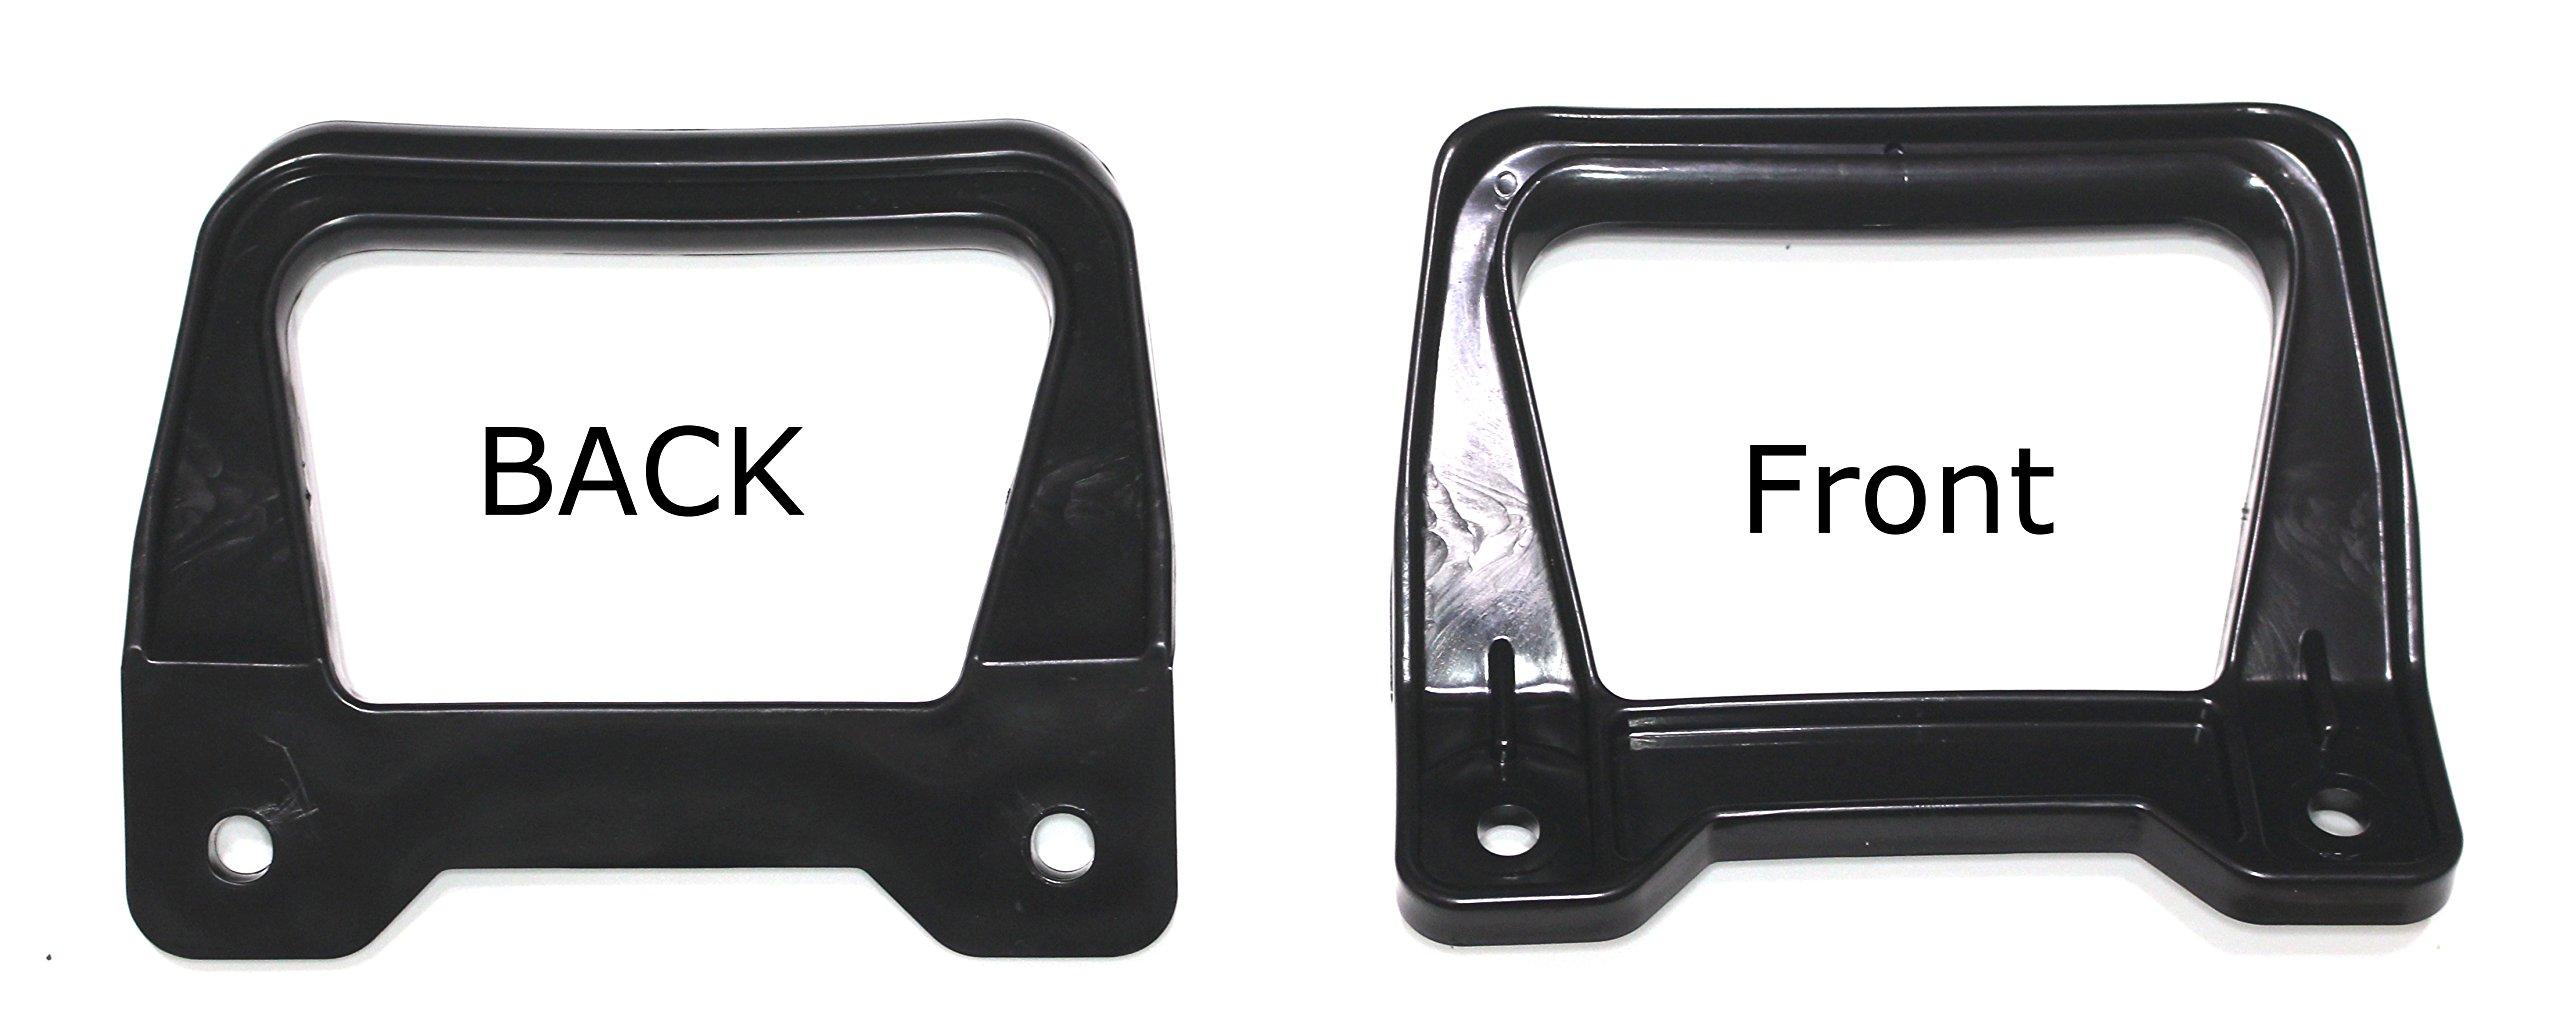 Rear Grab Bar Handle Replacement for Yamaha Waverunner III OEM# FJ0-63771-30-00 Jetski Grip 2 PK